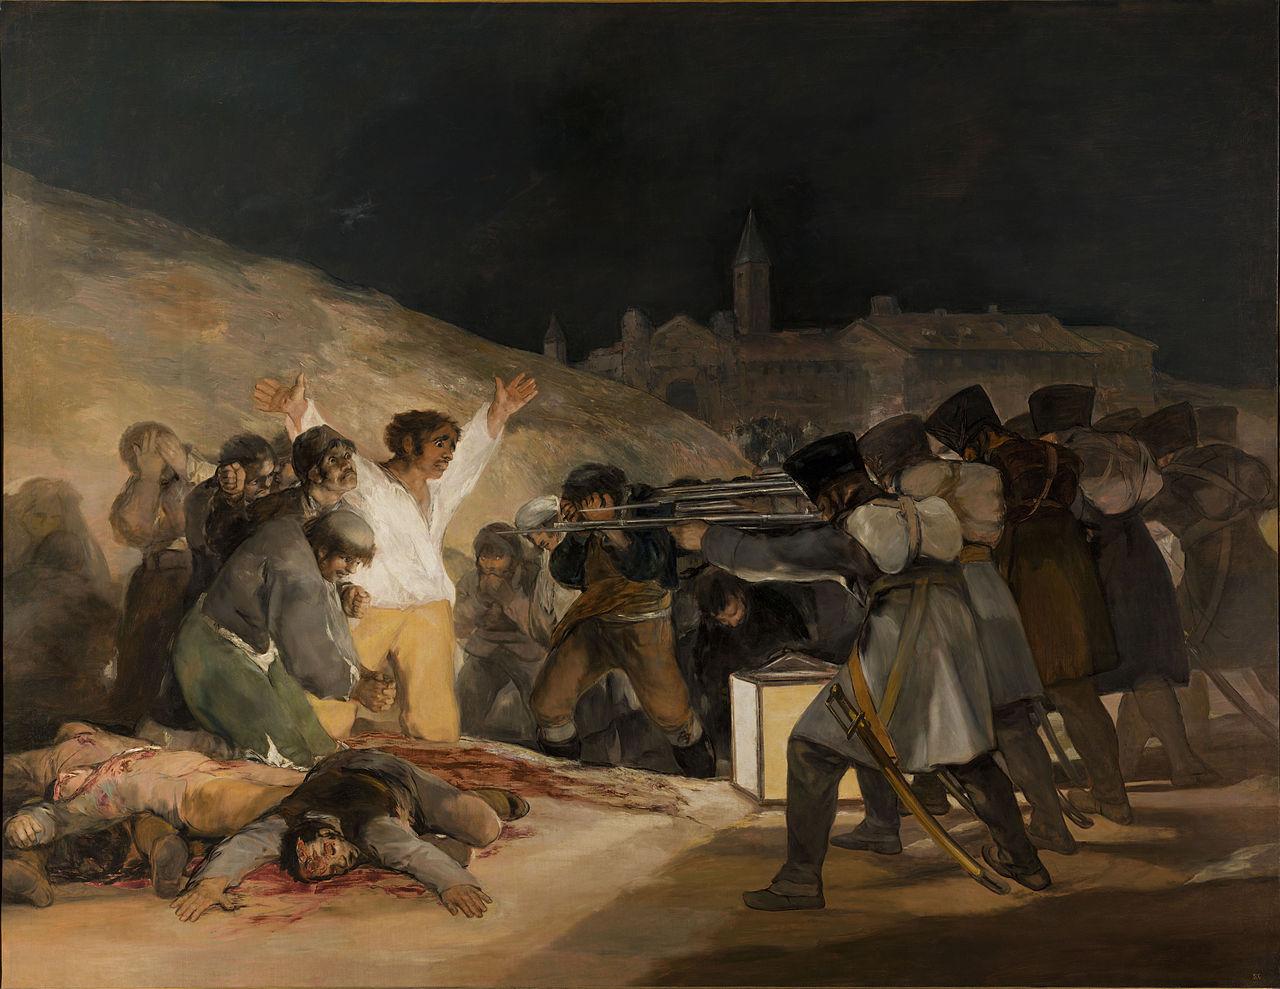 Goya, Francisco. The Third of May 1808 . 1814. Museo del Prado, Madrid, Spain.